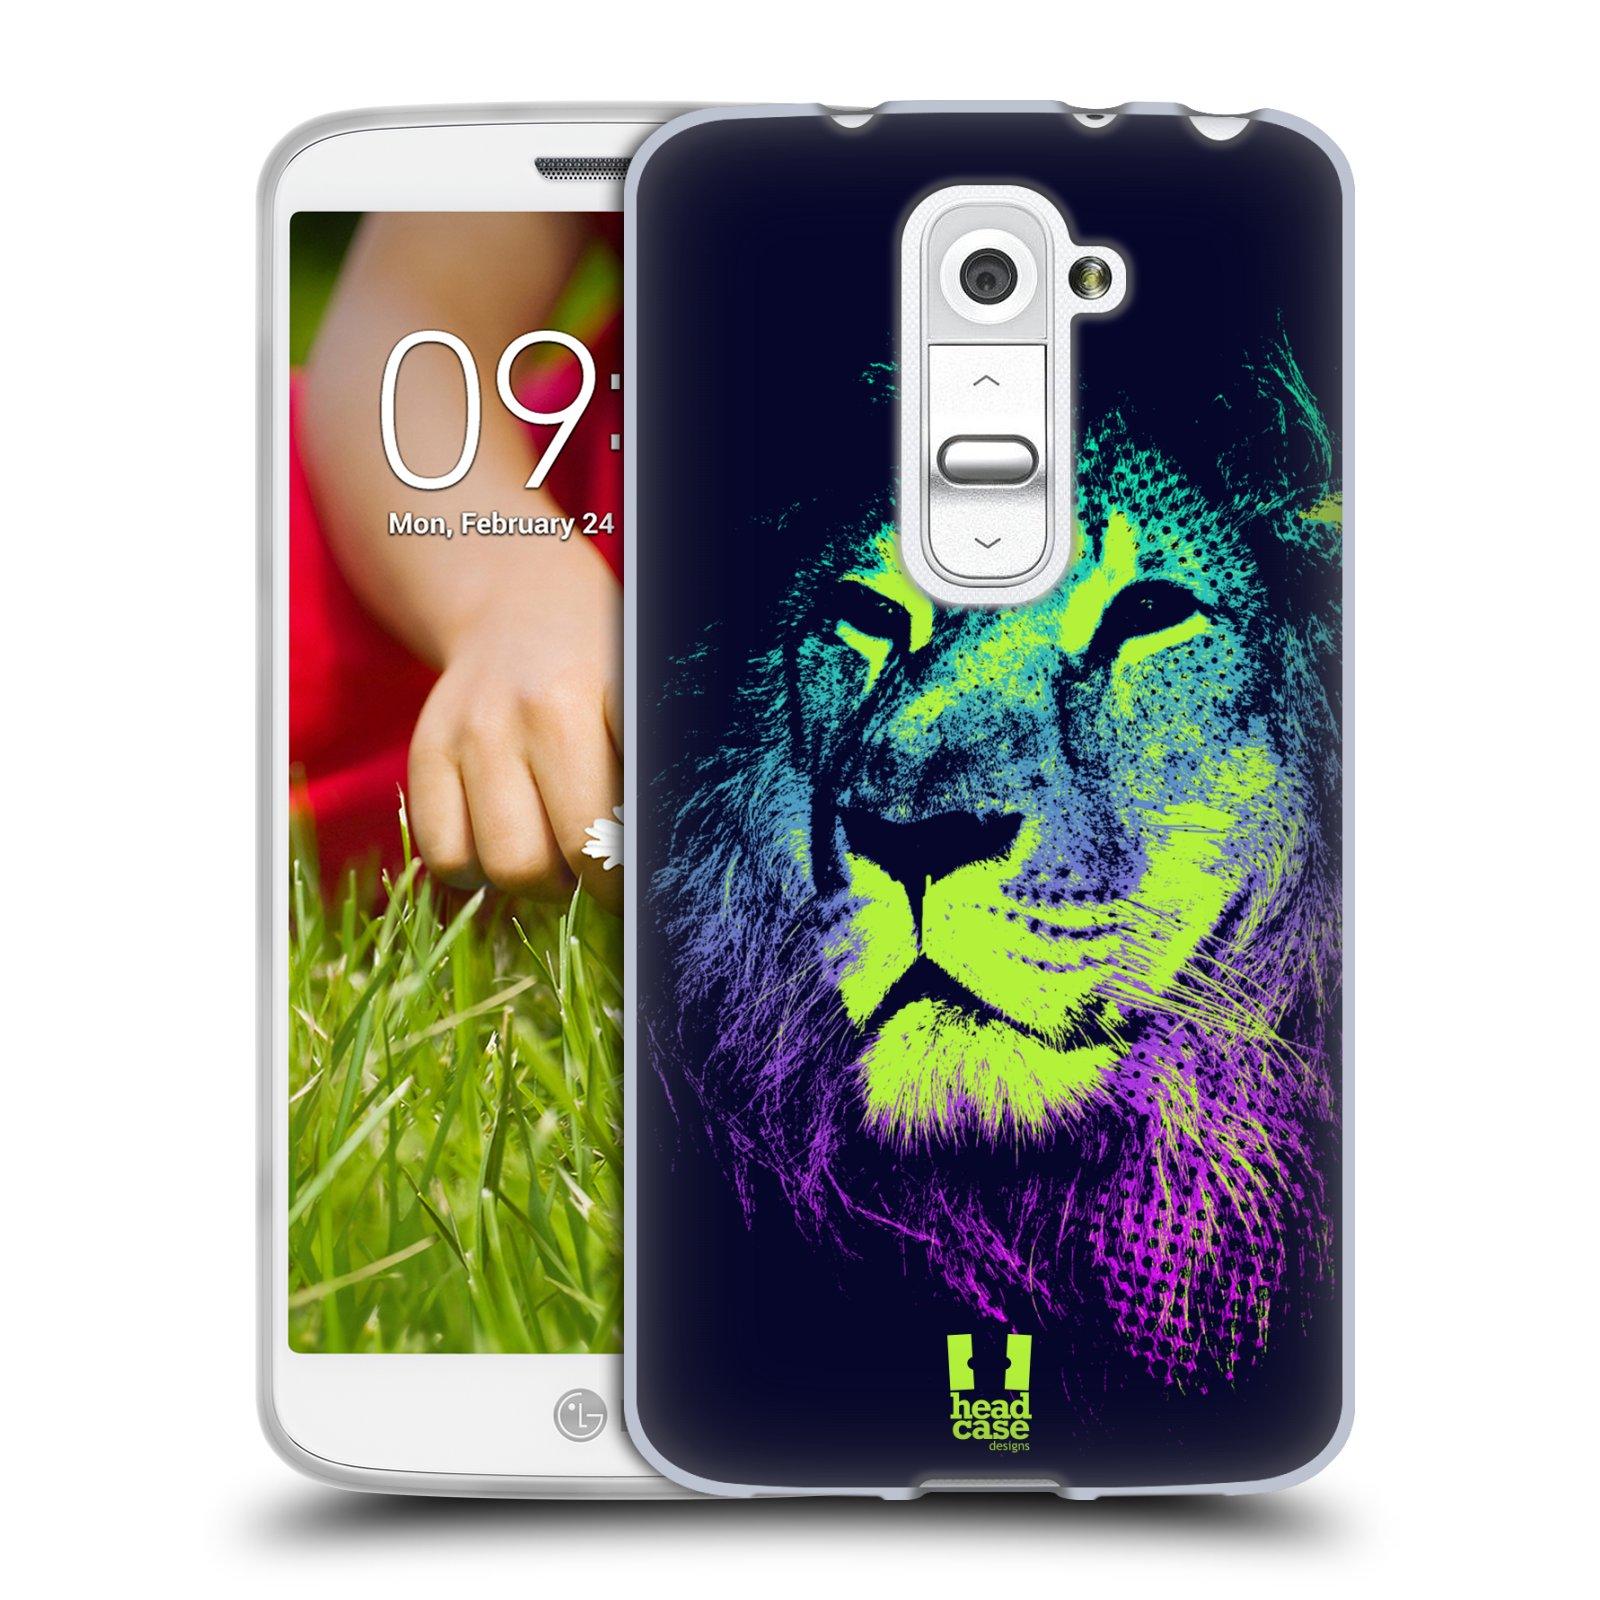 Silikonové pouzdro na mobil LG G2 Mini HEAD CASE POP PRINT LEV (Silikonový kryt či obal na mobilní telefon LG G2 Mini D620)